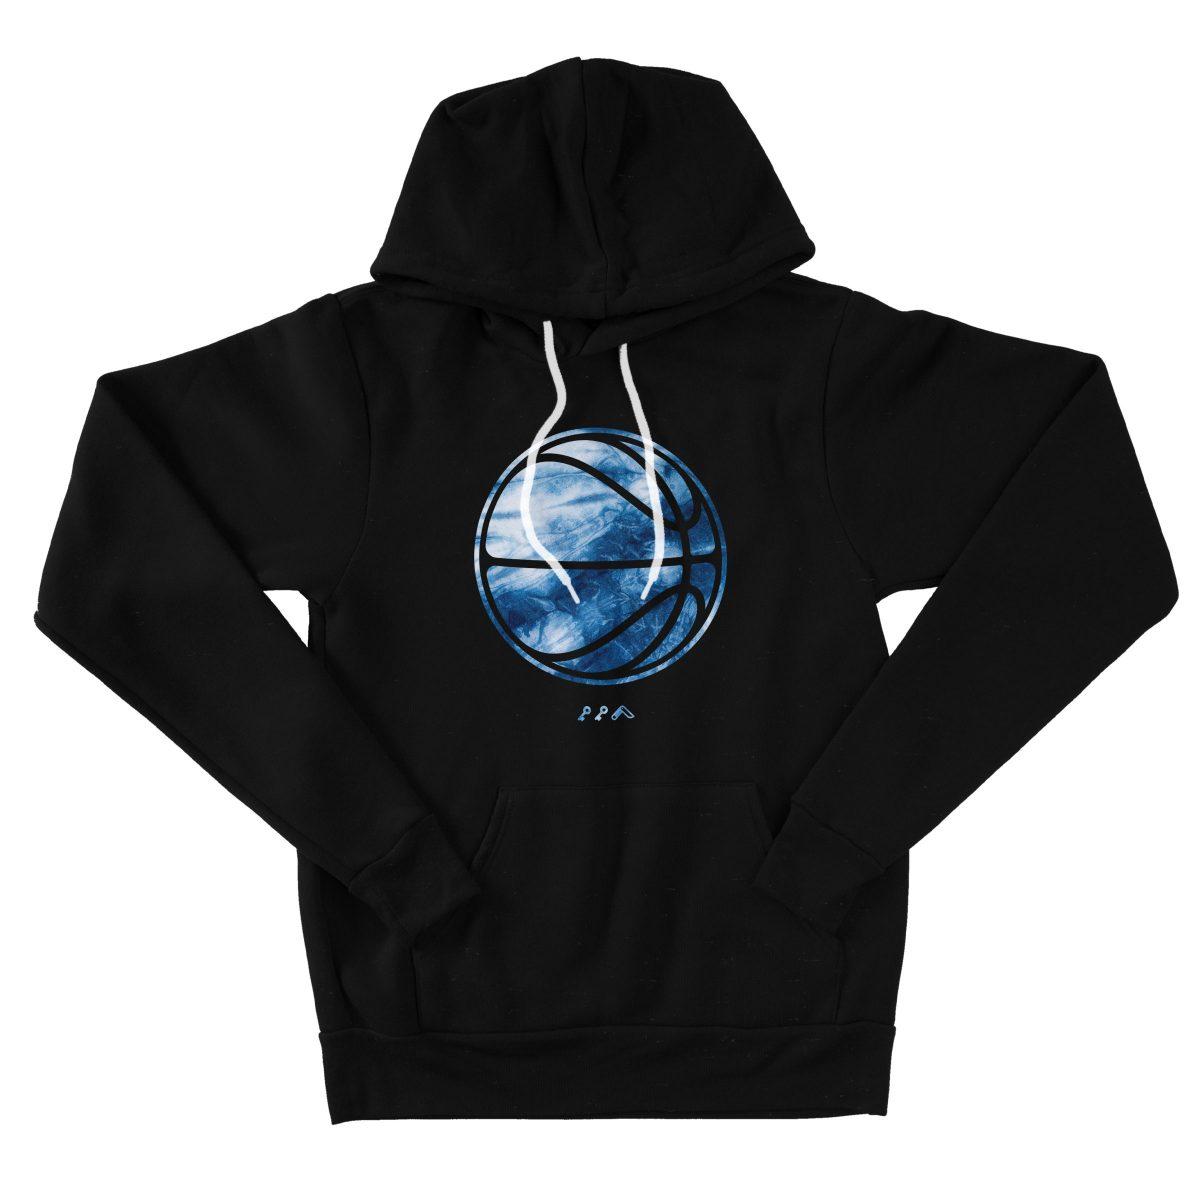 indigo backetball hoodies by kikicutt sweatshirt store